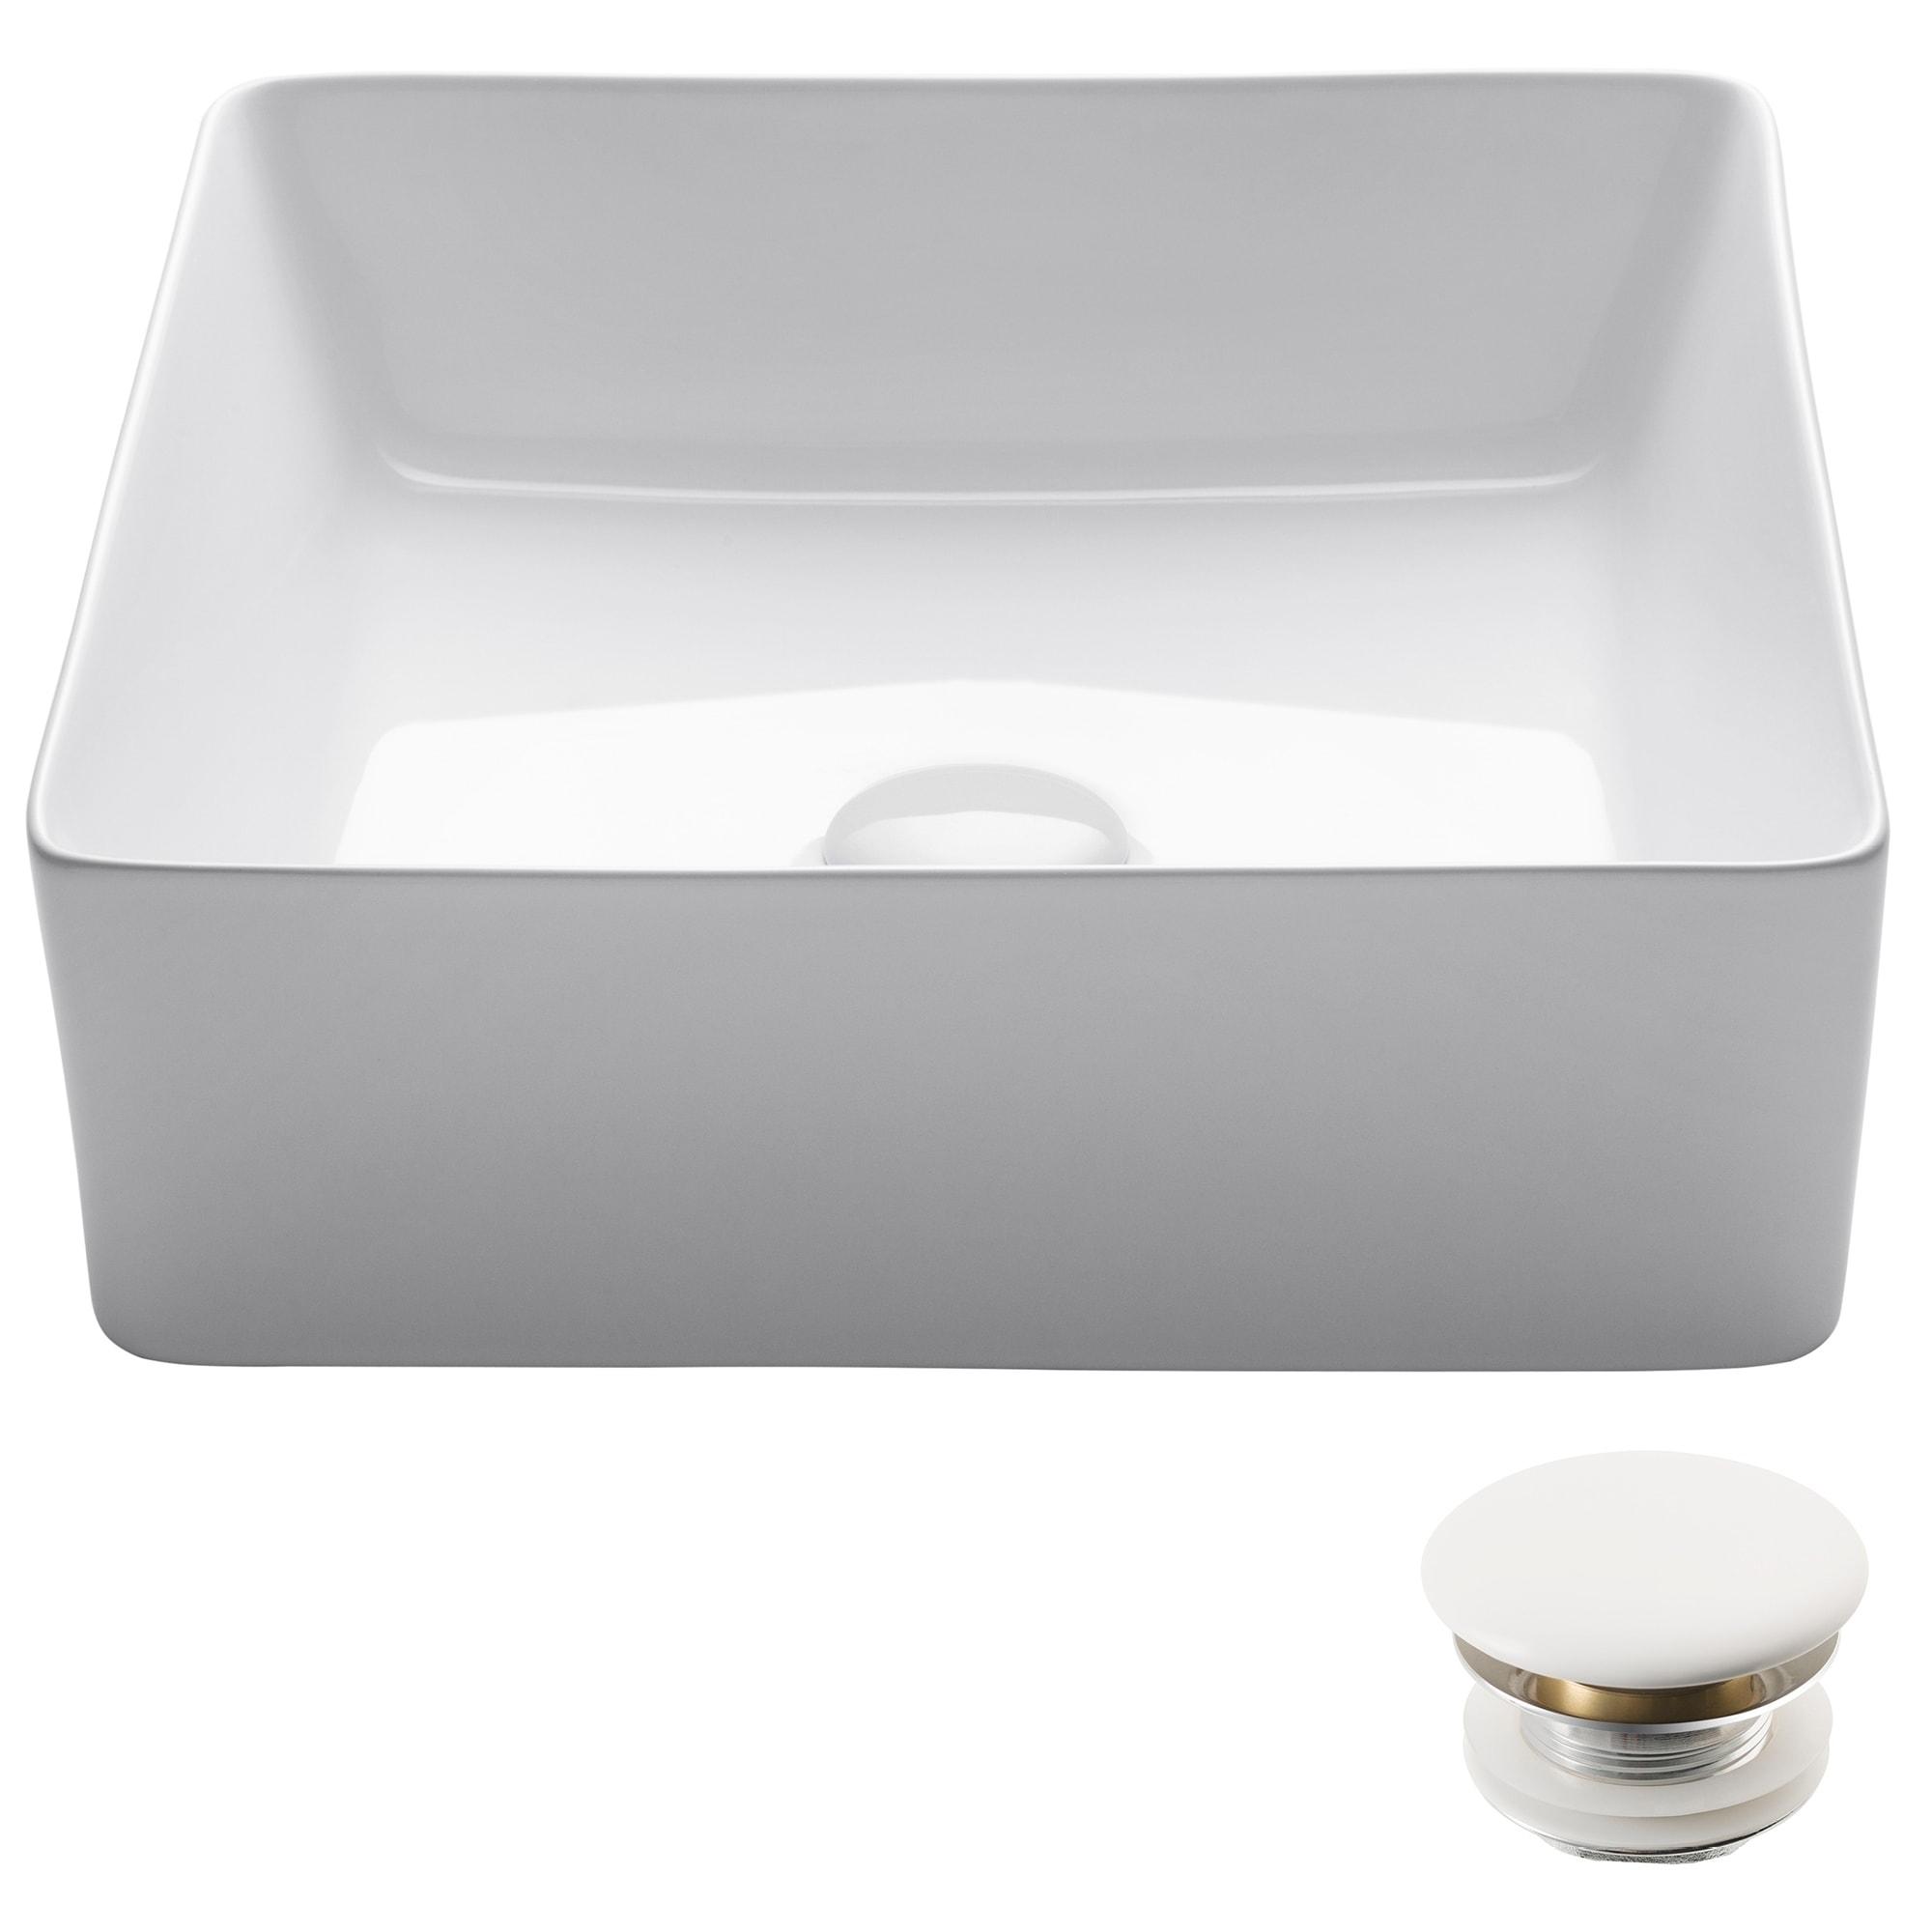 Kraus Kcv 202gwh Viva Square White Porcelain Ceramic Vessel Bathroom Sink Pop Up Drain